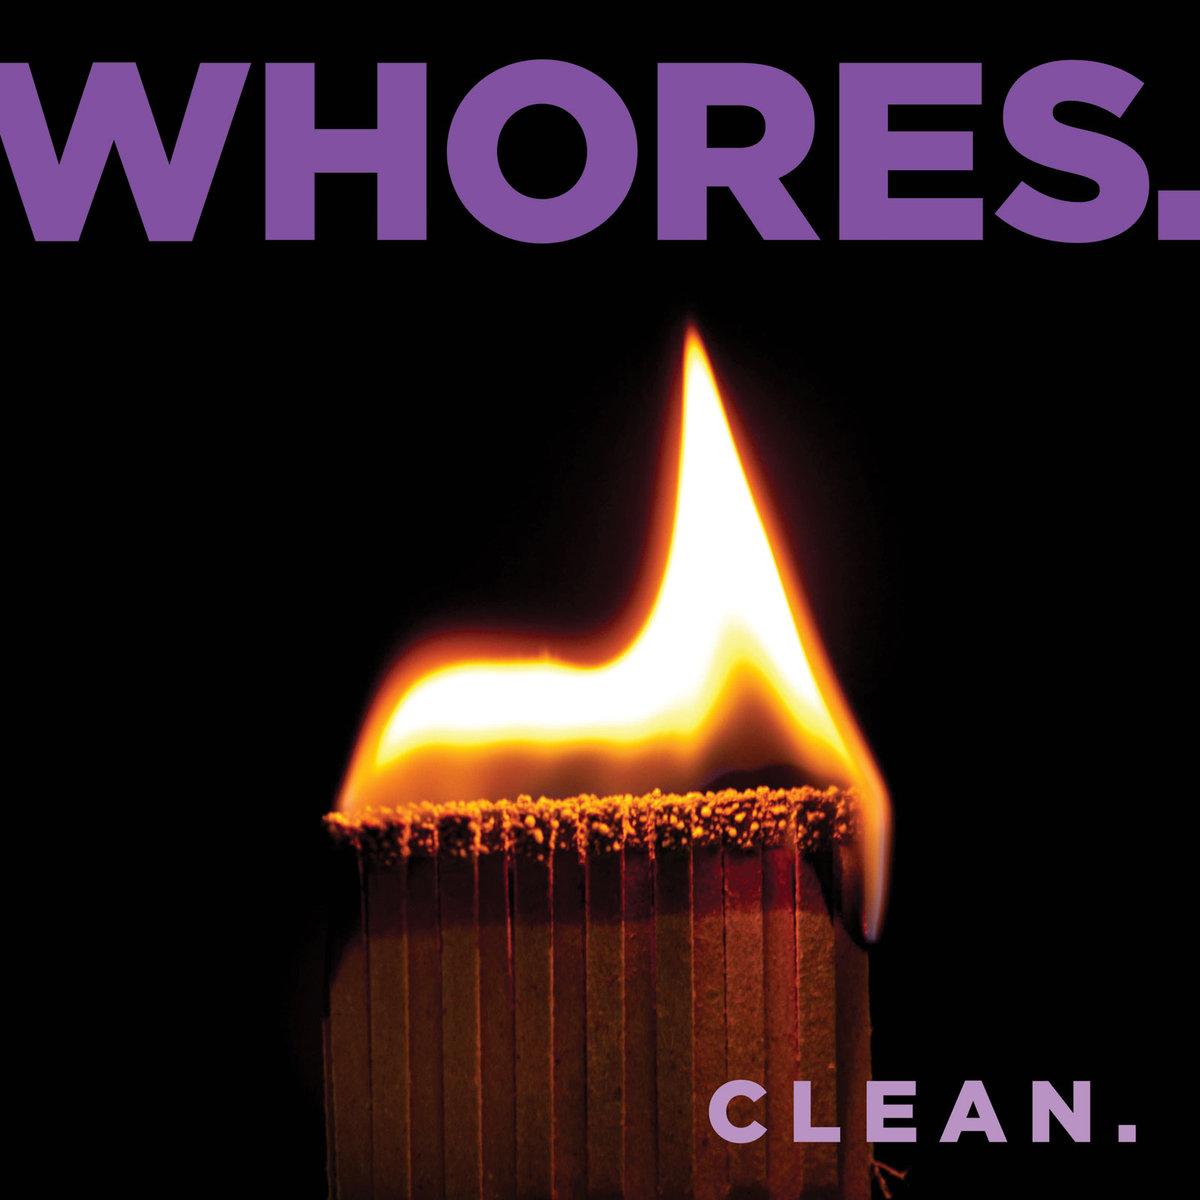 Whores -